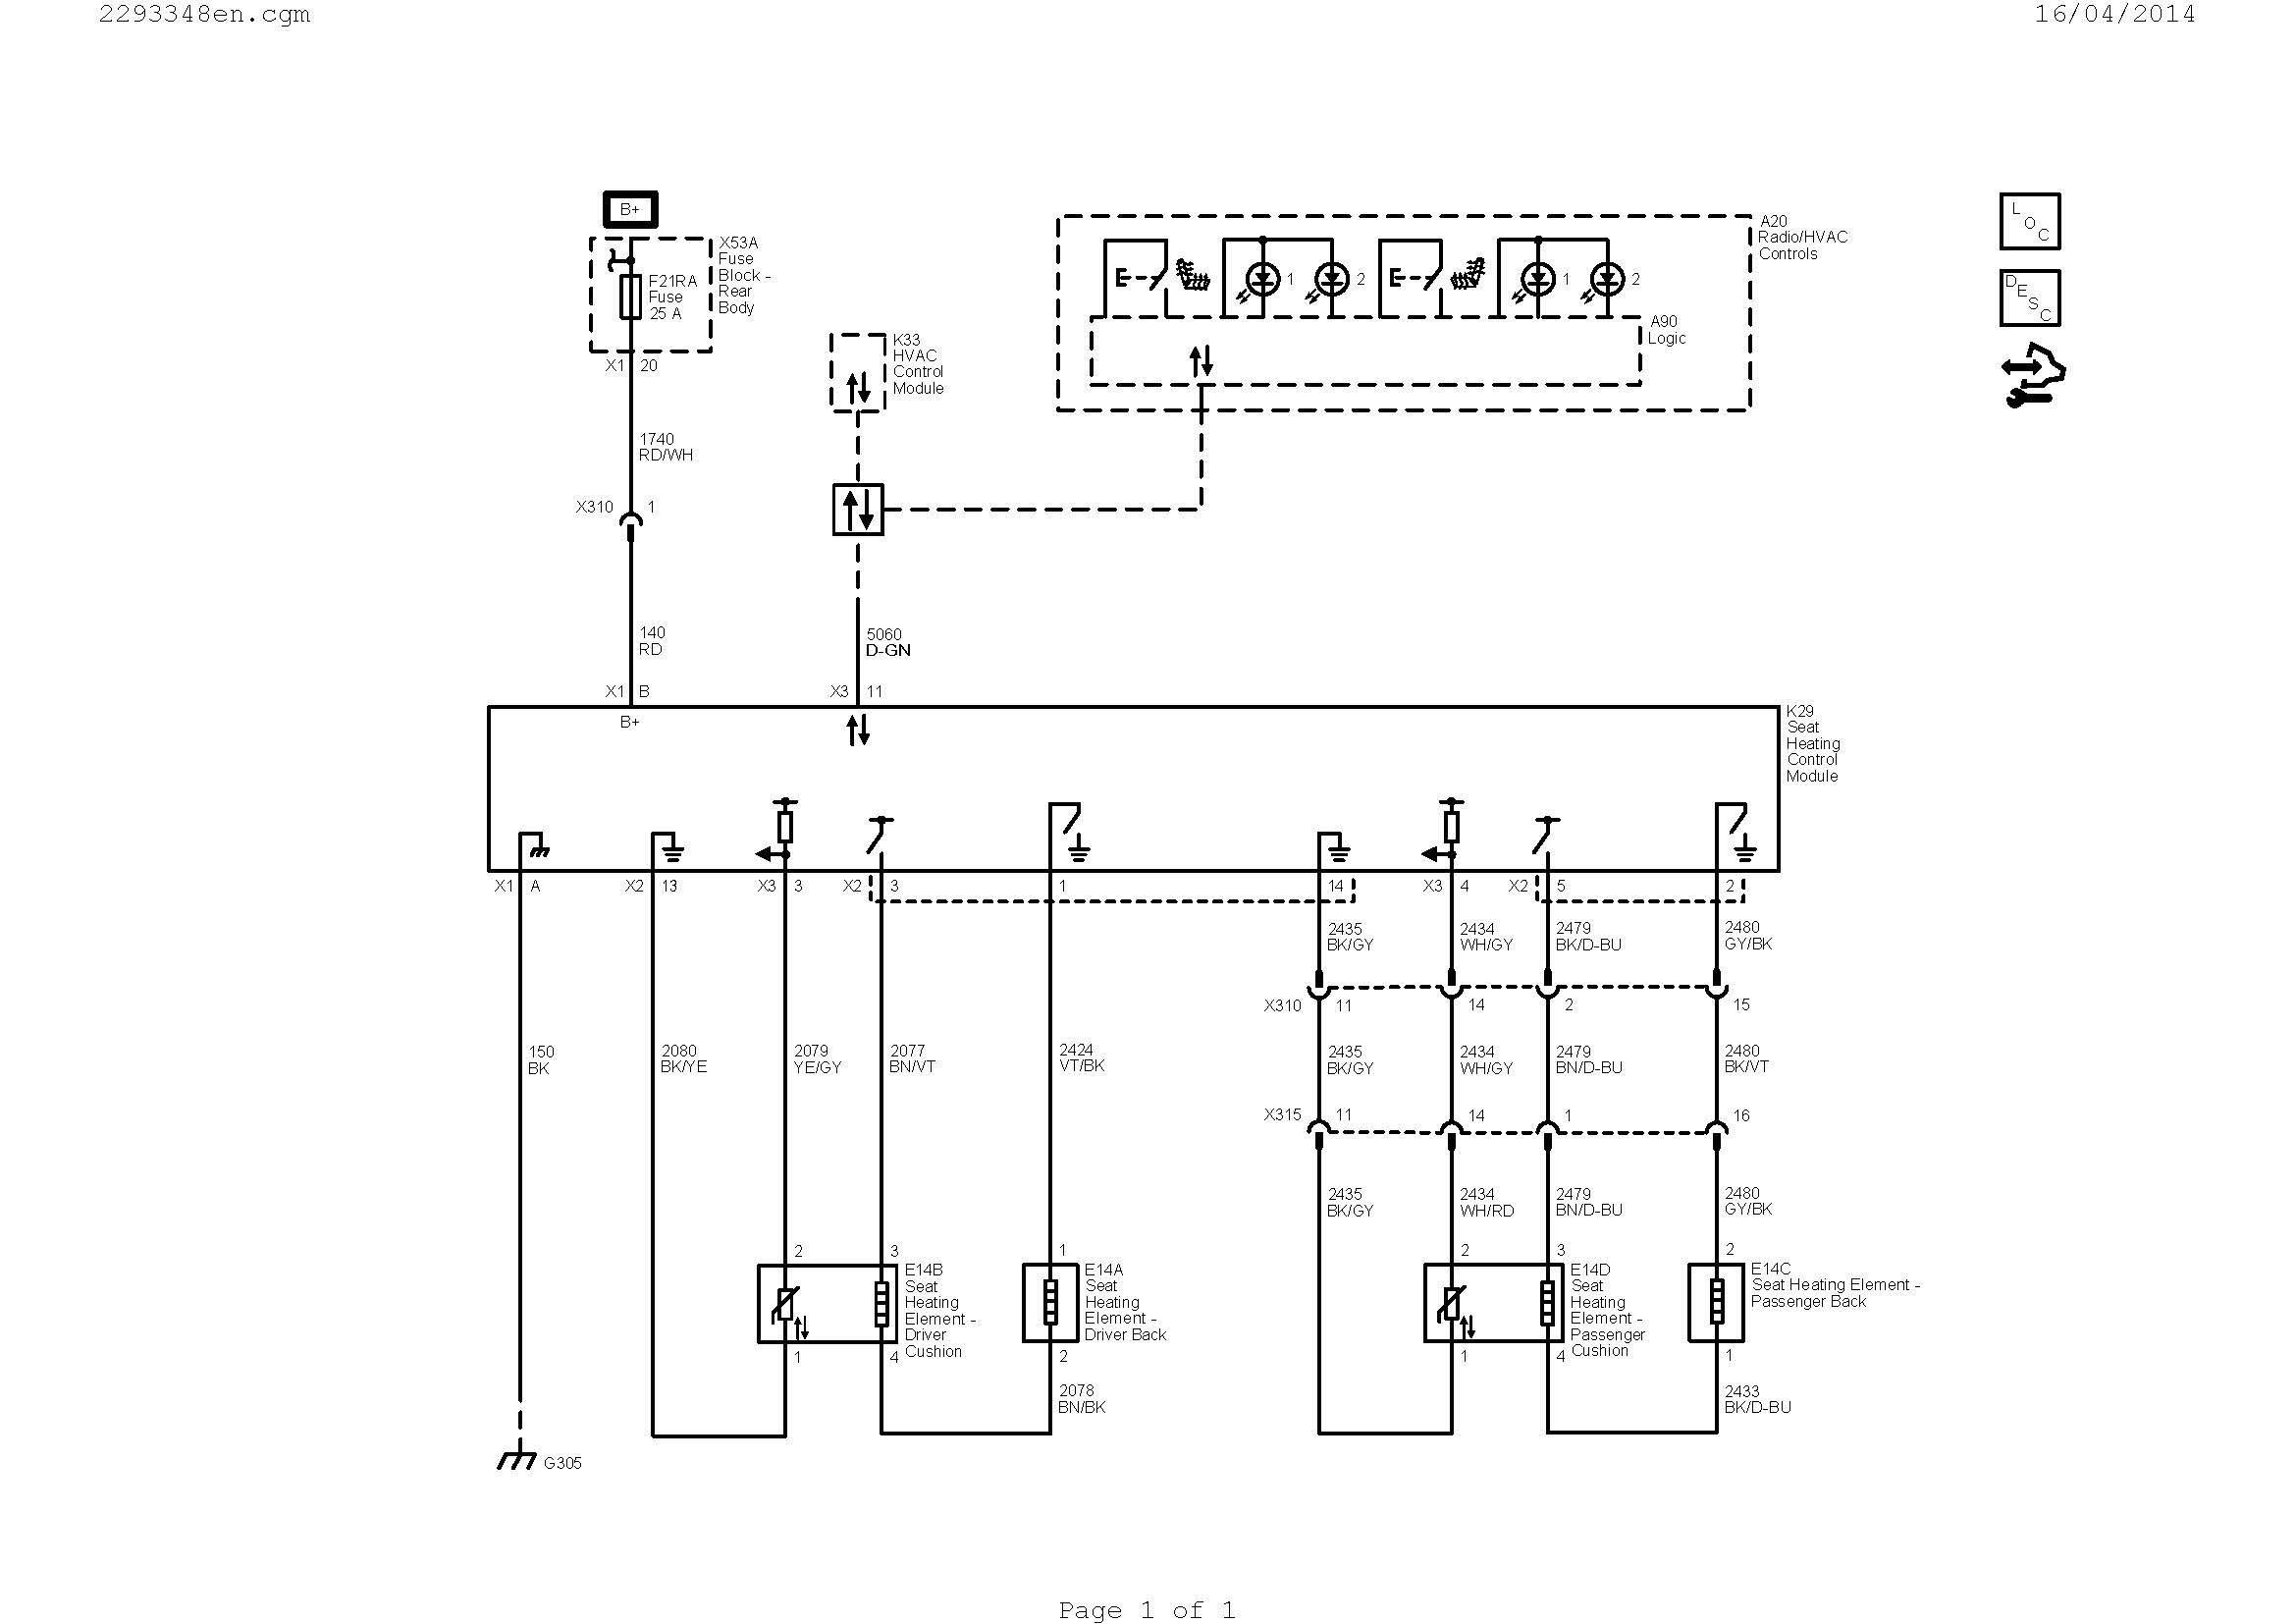 car alarm installation wiring diagram Collection-Car sound Wiring Diagram Vr3 Car Stereo Wiring Diagram Best Mechanical Engineering Diagrams Hvac Diagram 8-n